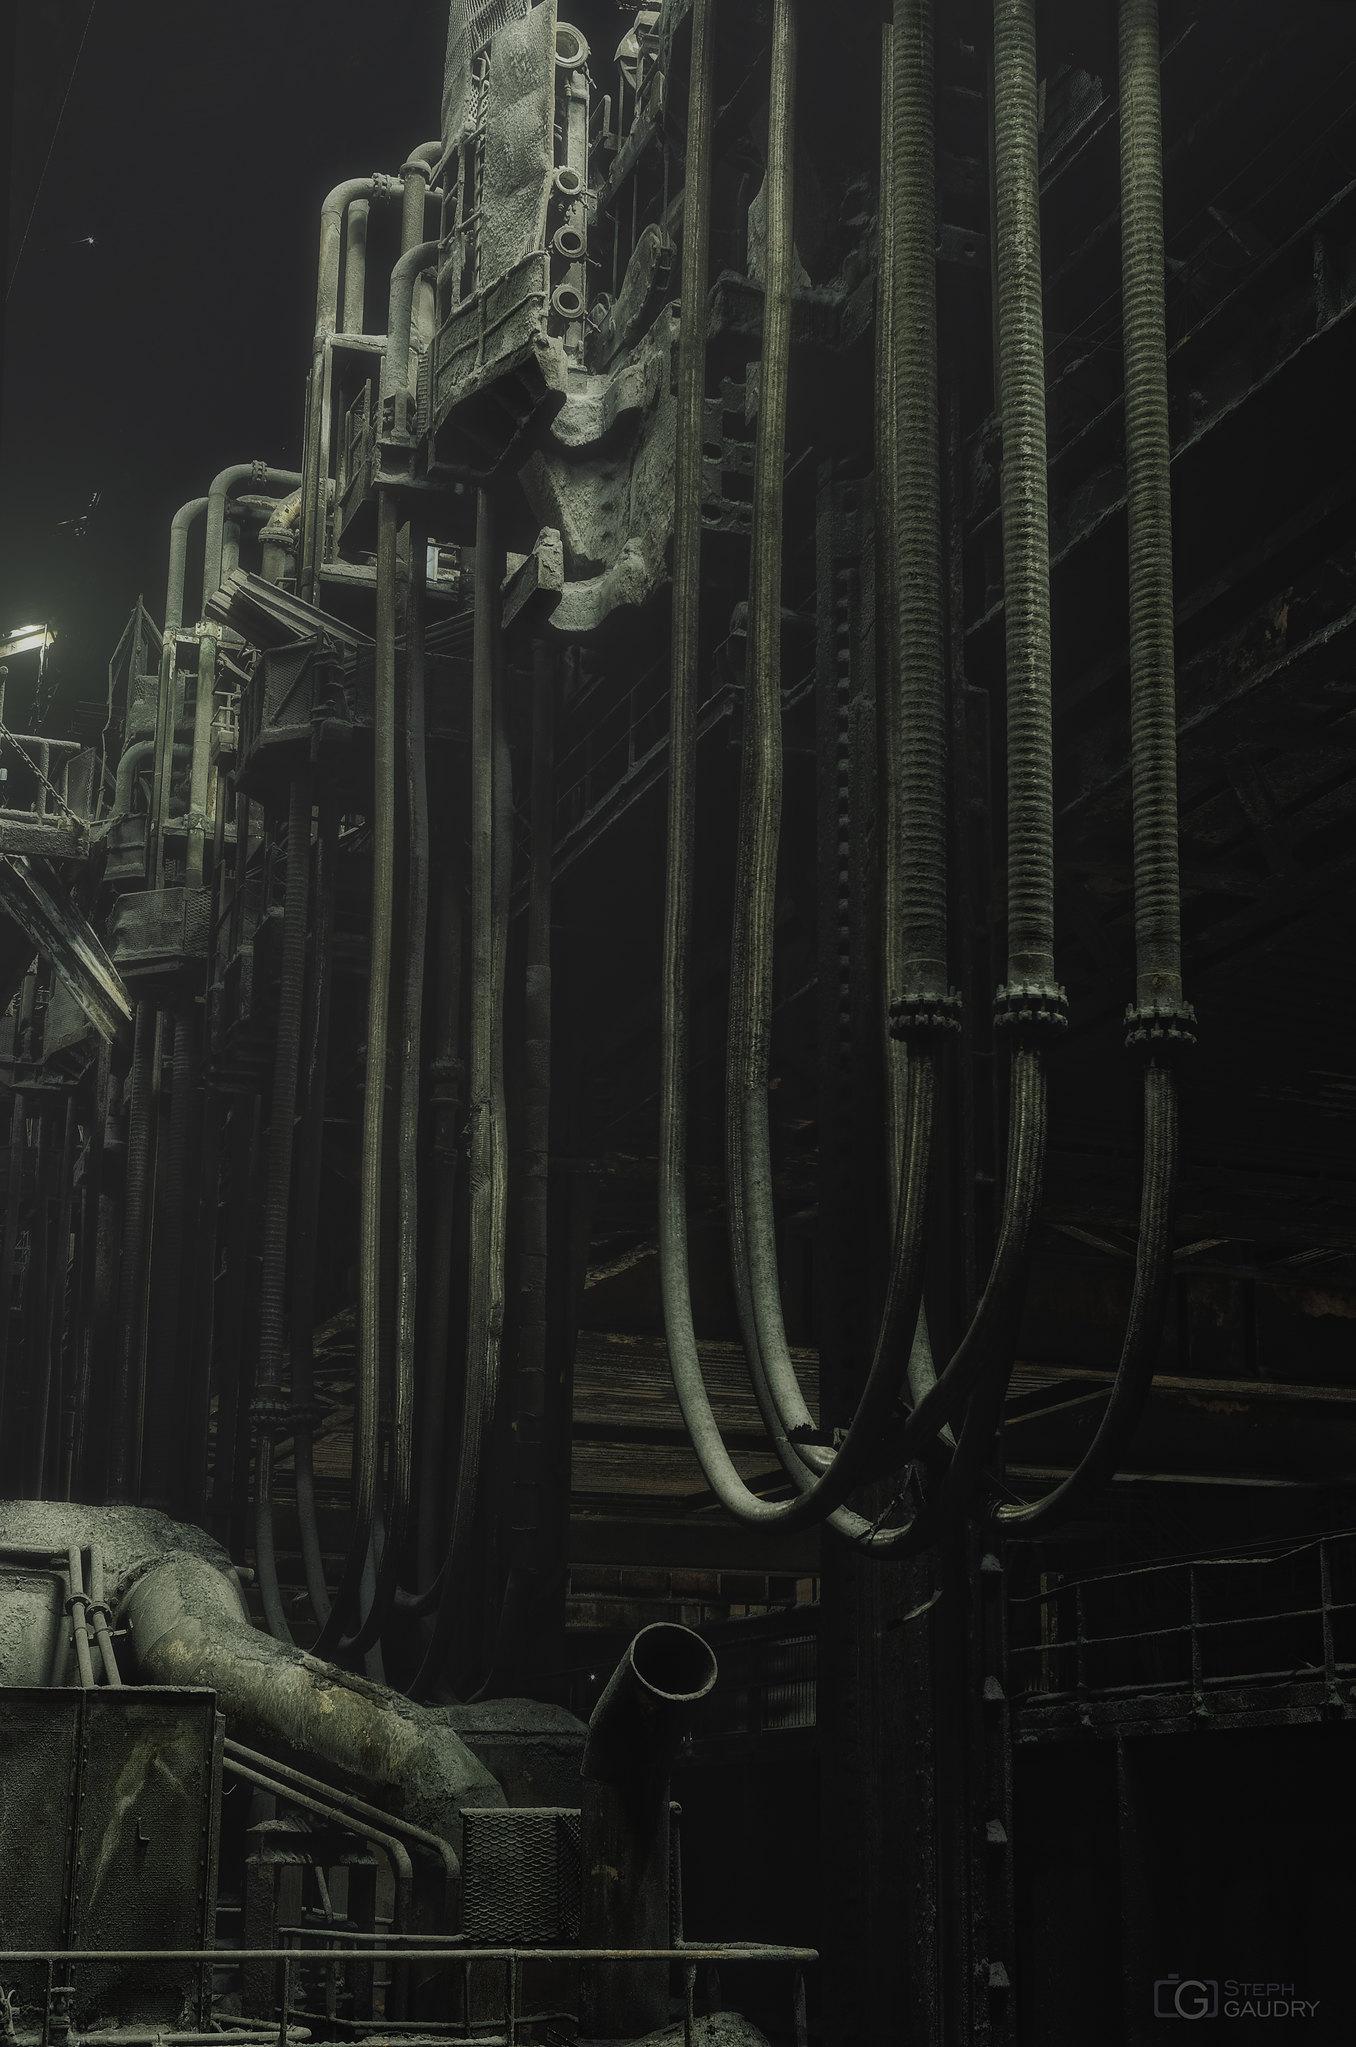 Necronom's environment [Click to start slideshow]